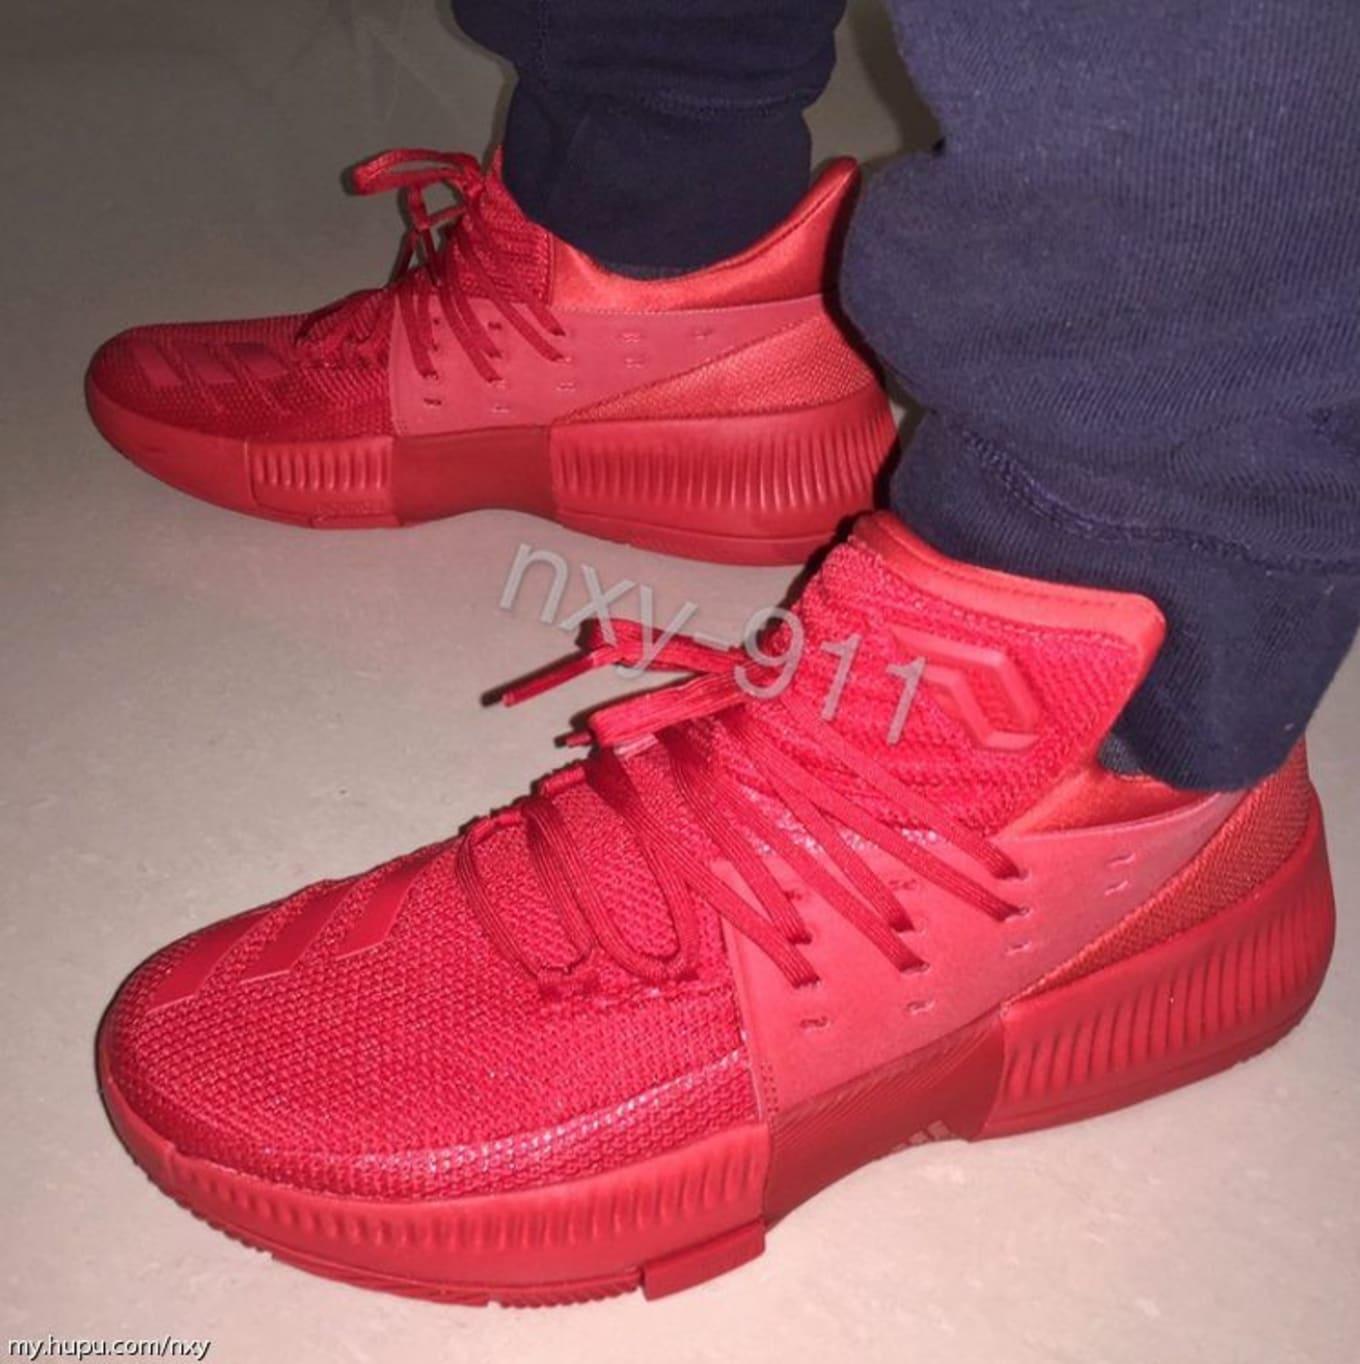 adidas Dame 3 On Tour BB8269 Release Date Sneaker Bar Detroit